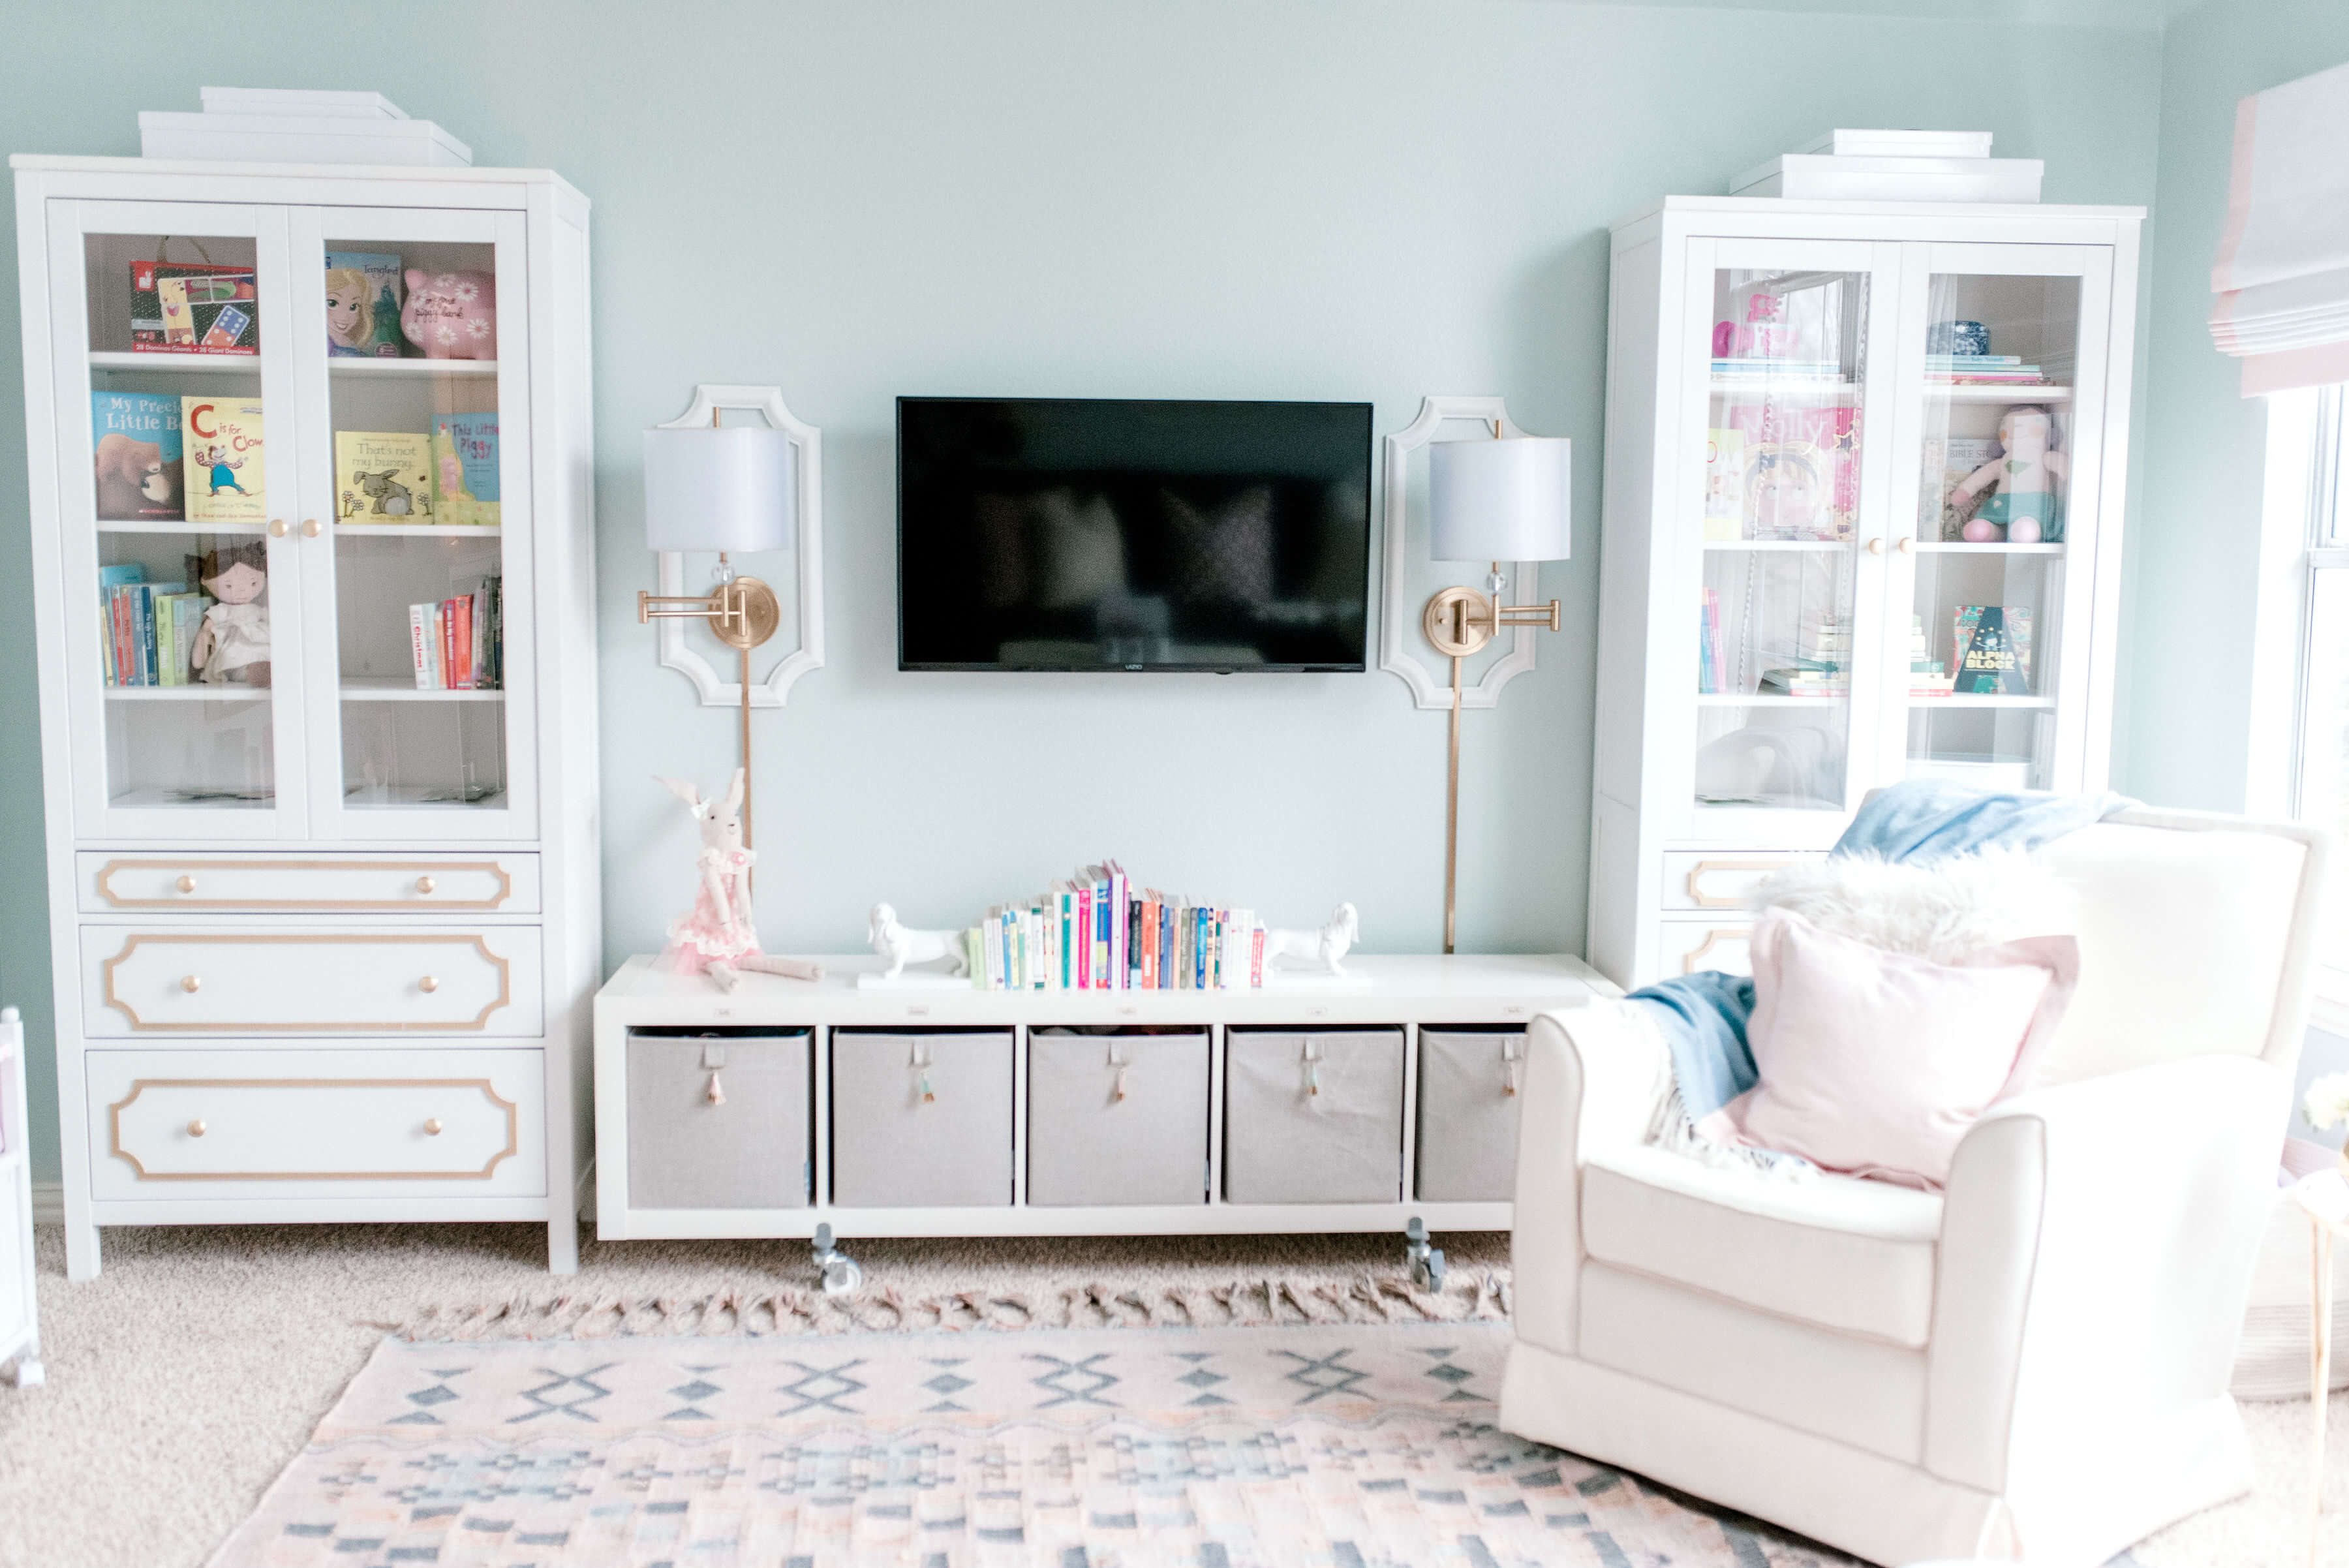 Playroom Reveal | Dallas Home Edition